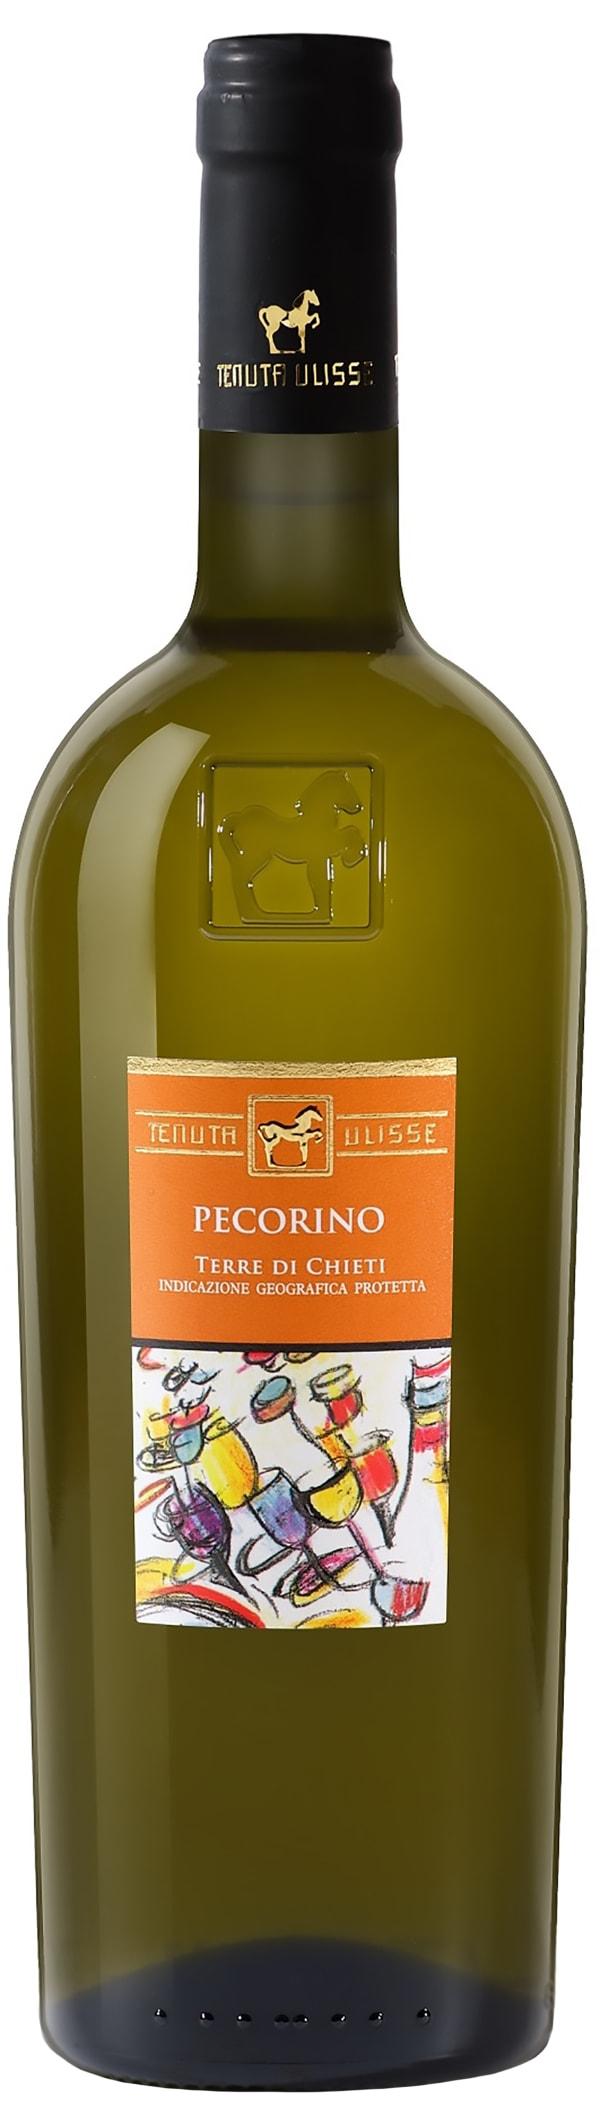 Tenuta Ulisse Pecorino 2016